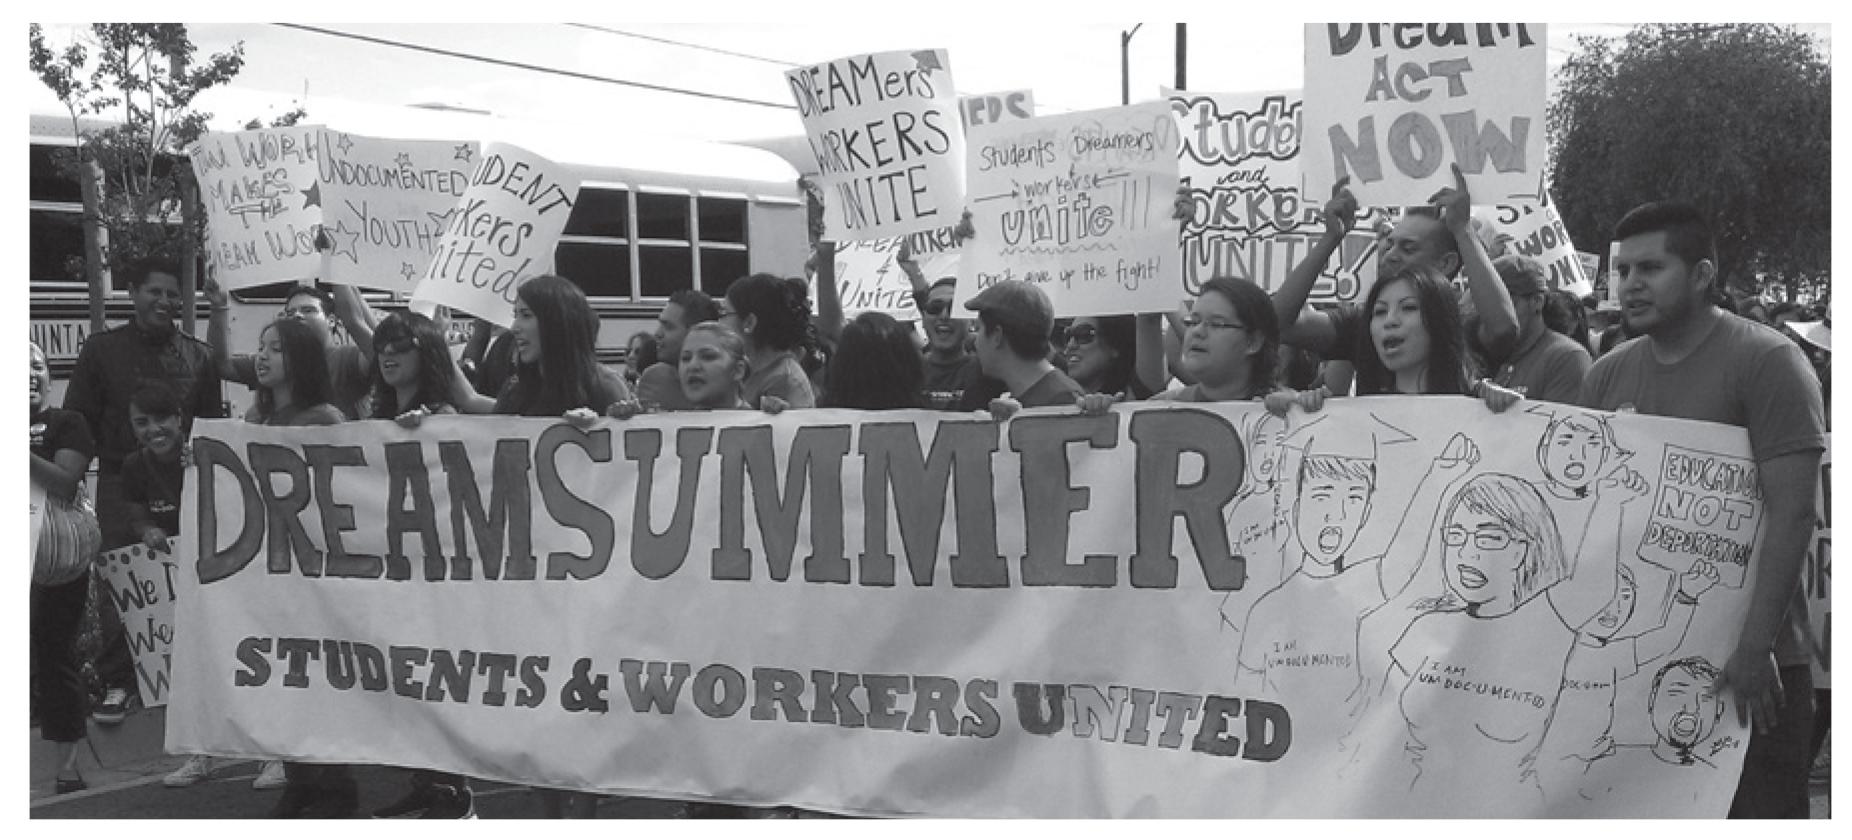 b&w_dreamsummer_protest